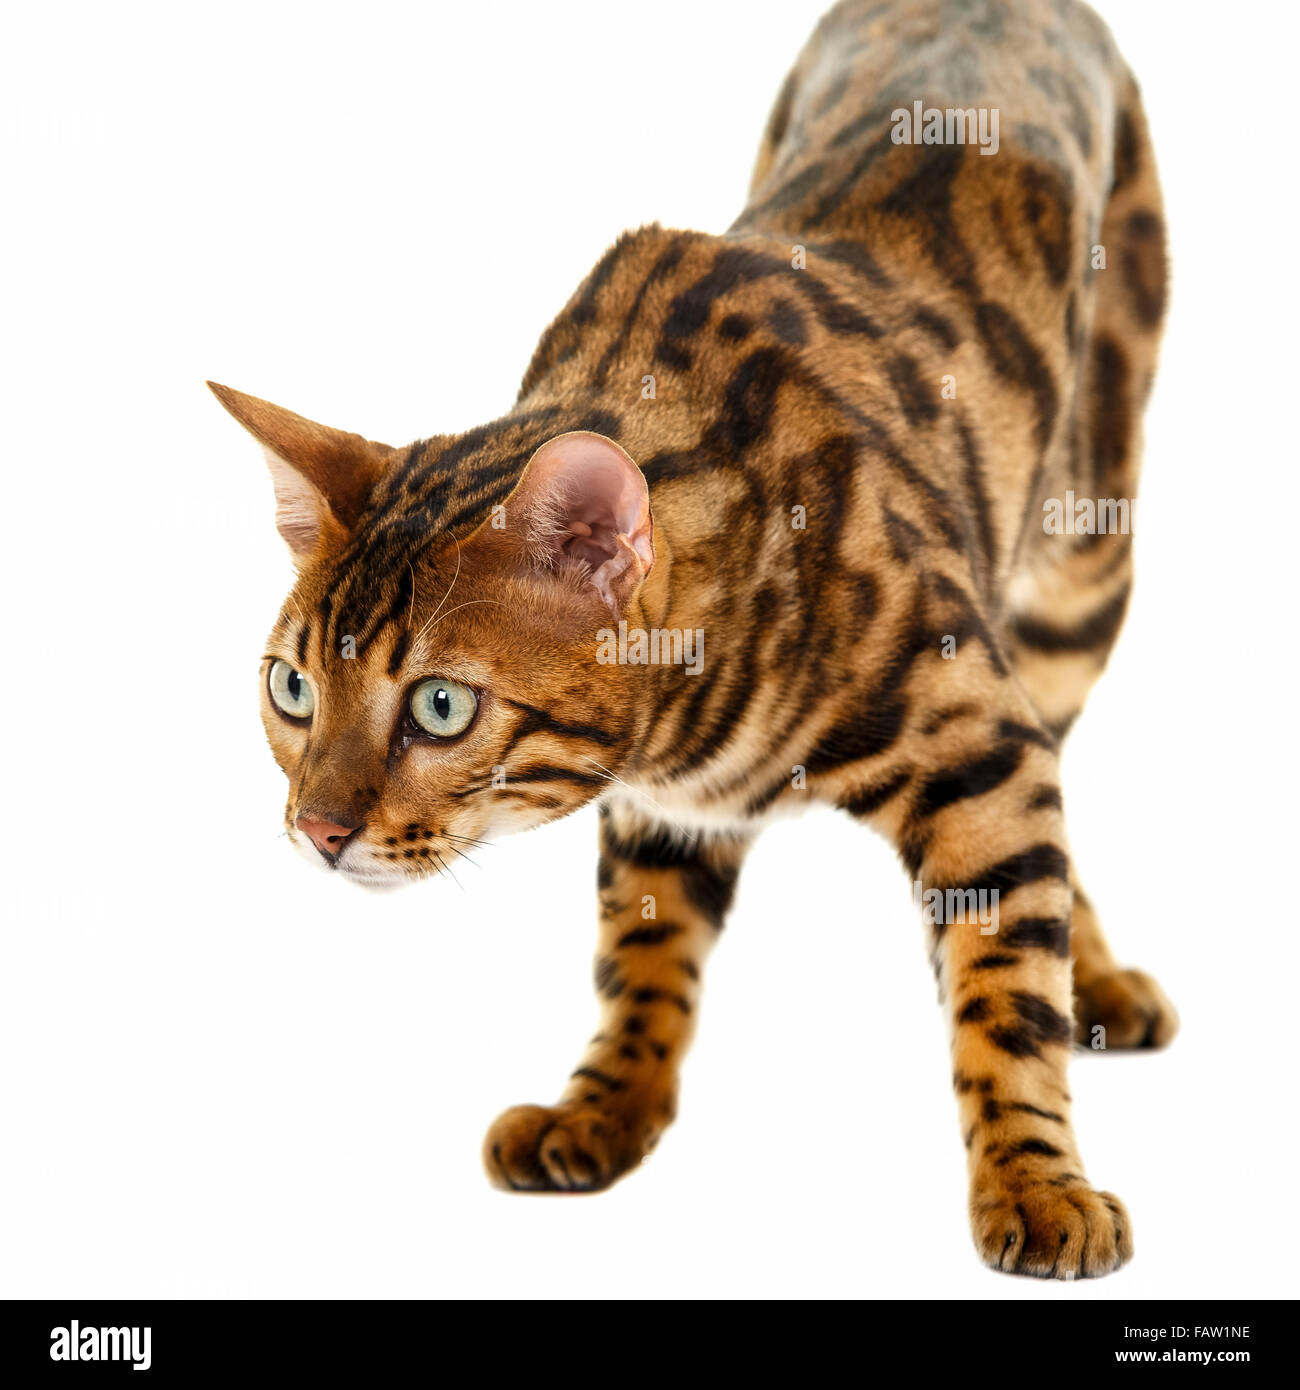 Gato de Bengala macho retrato aislado sobre fondo blanco modelo de liberación: nº de propiedad: Release Imagen De Stock